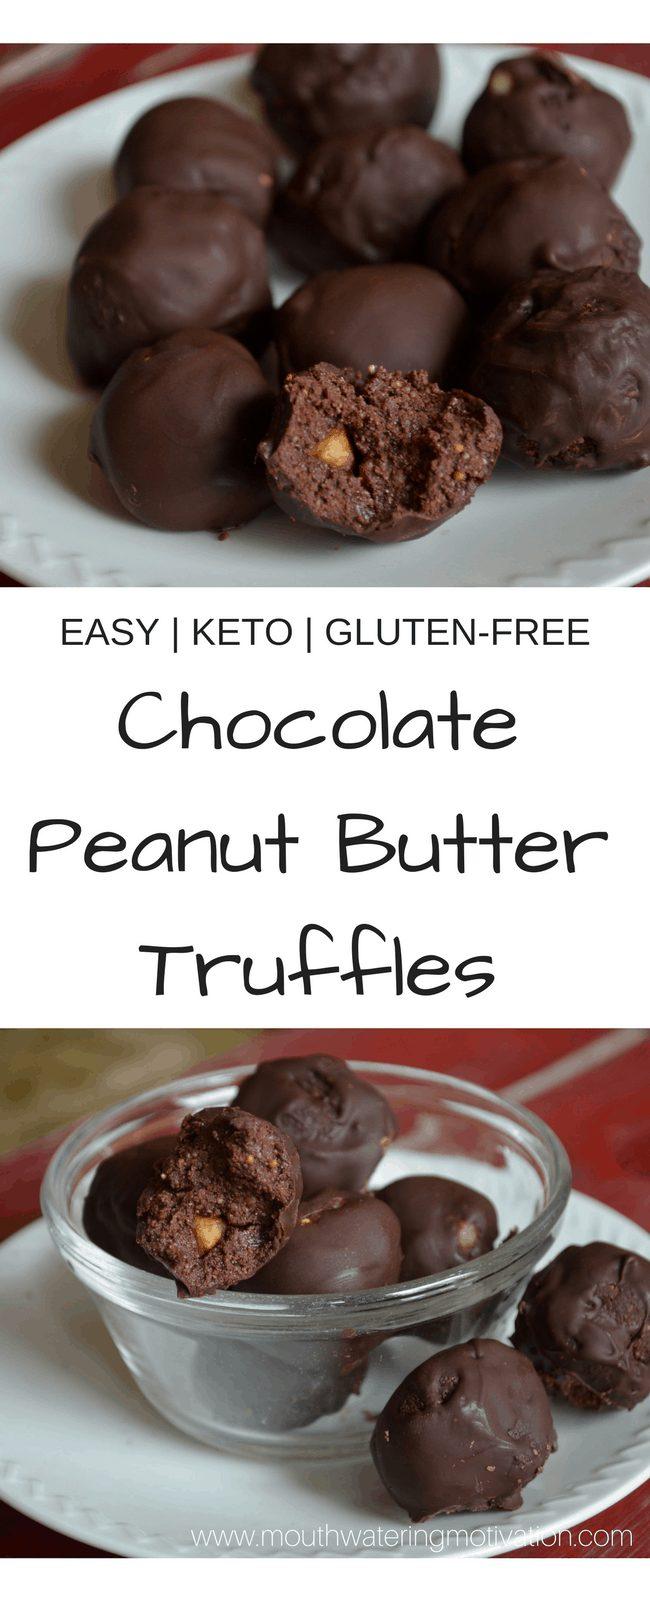 Chocolate Peanut Butter Truffles.png